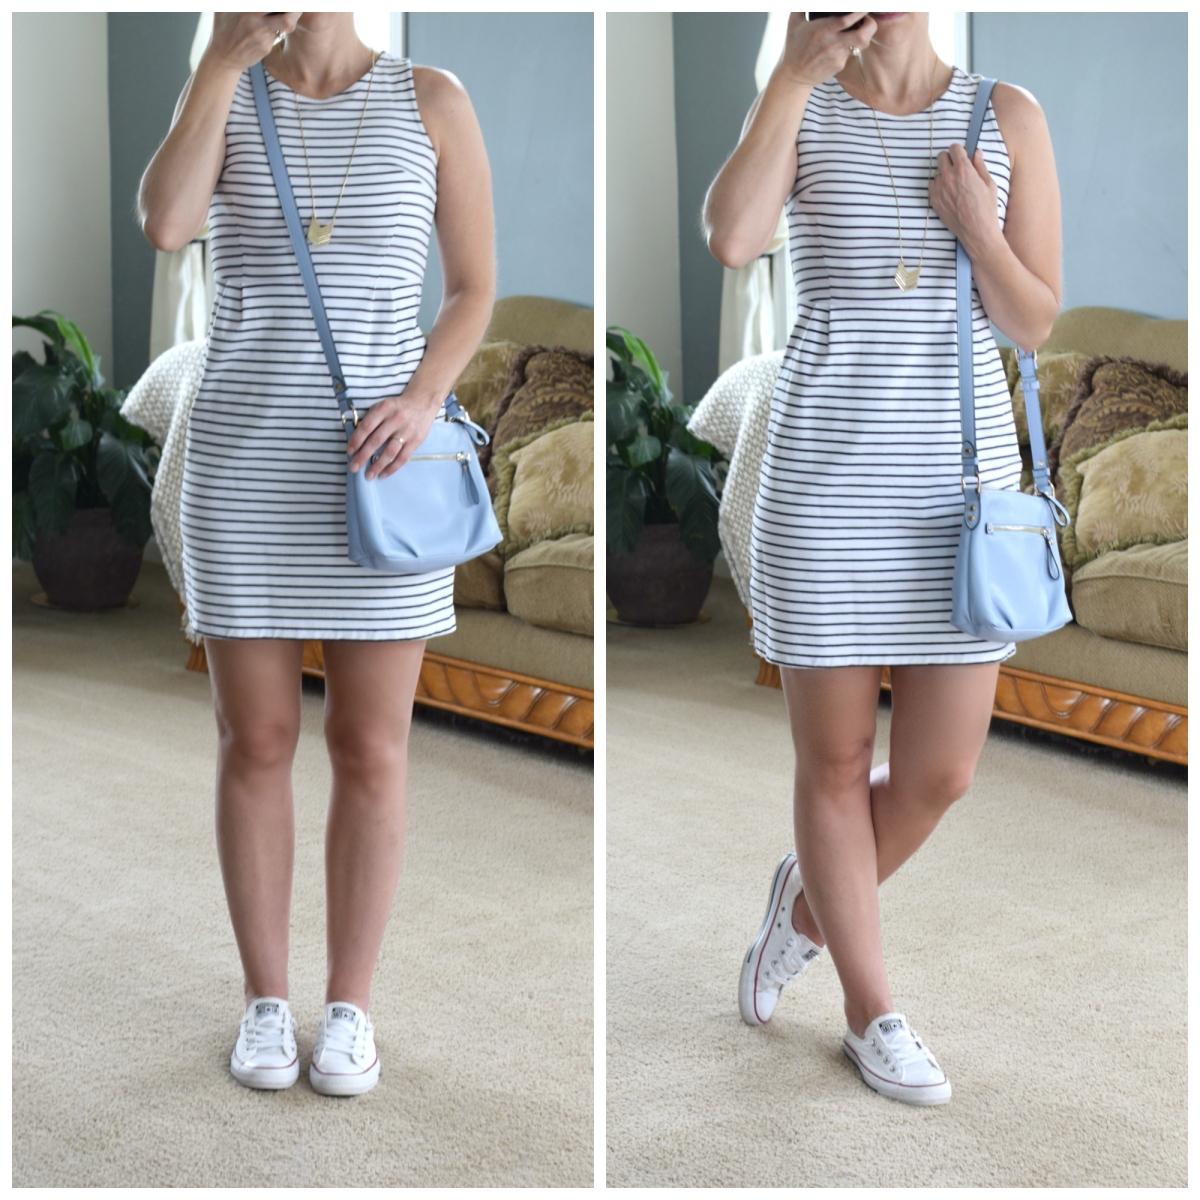 perfect striped dress, chucks, and pastel blue shoulder bag |www.pearlsandsportsbras.com|